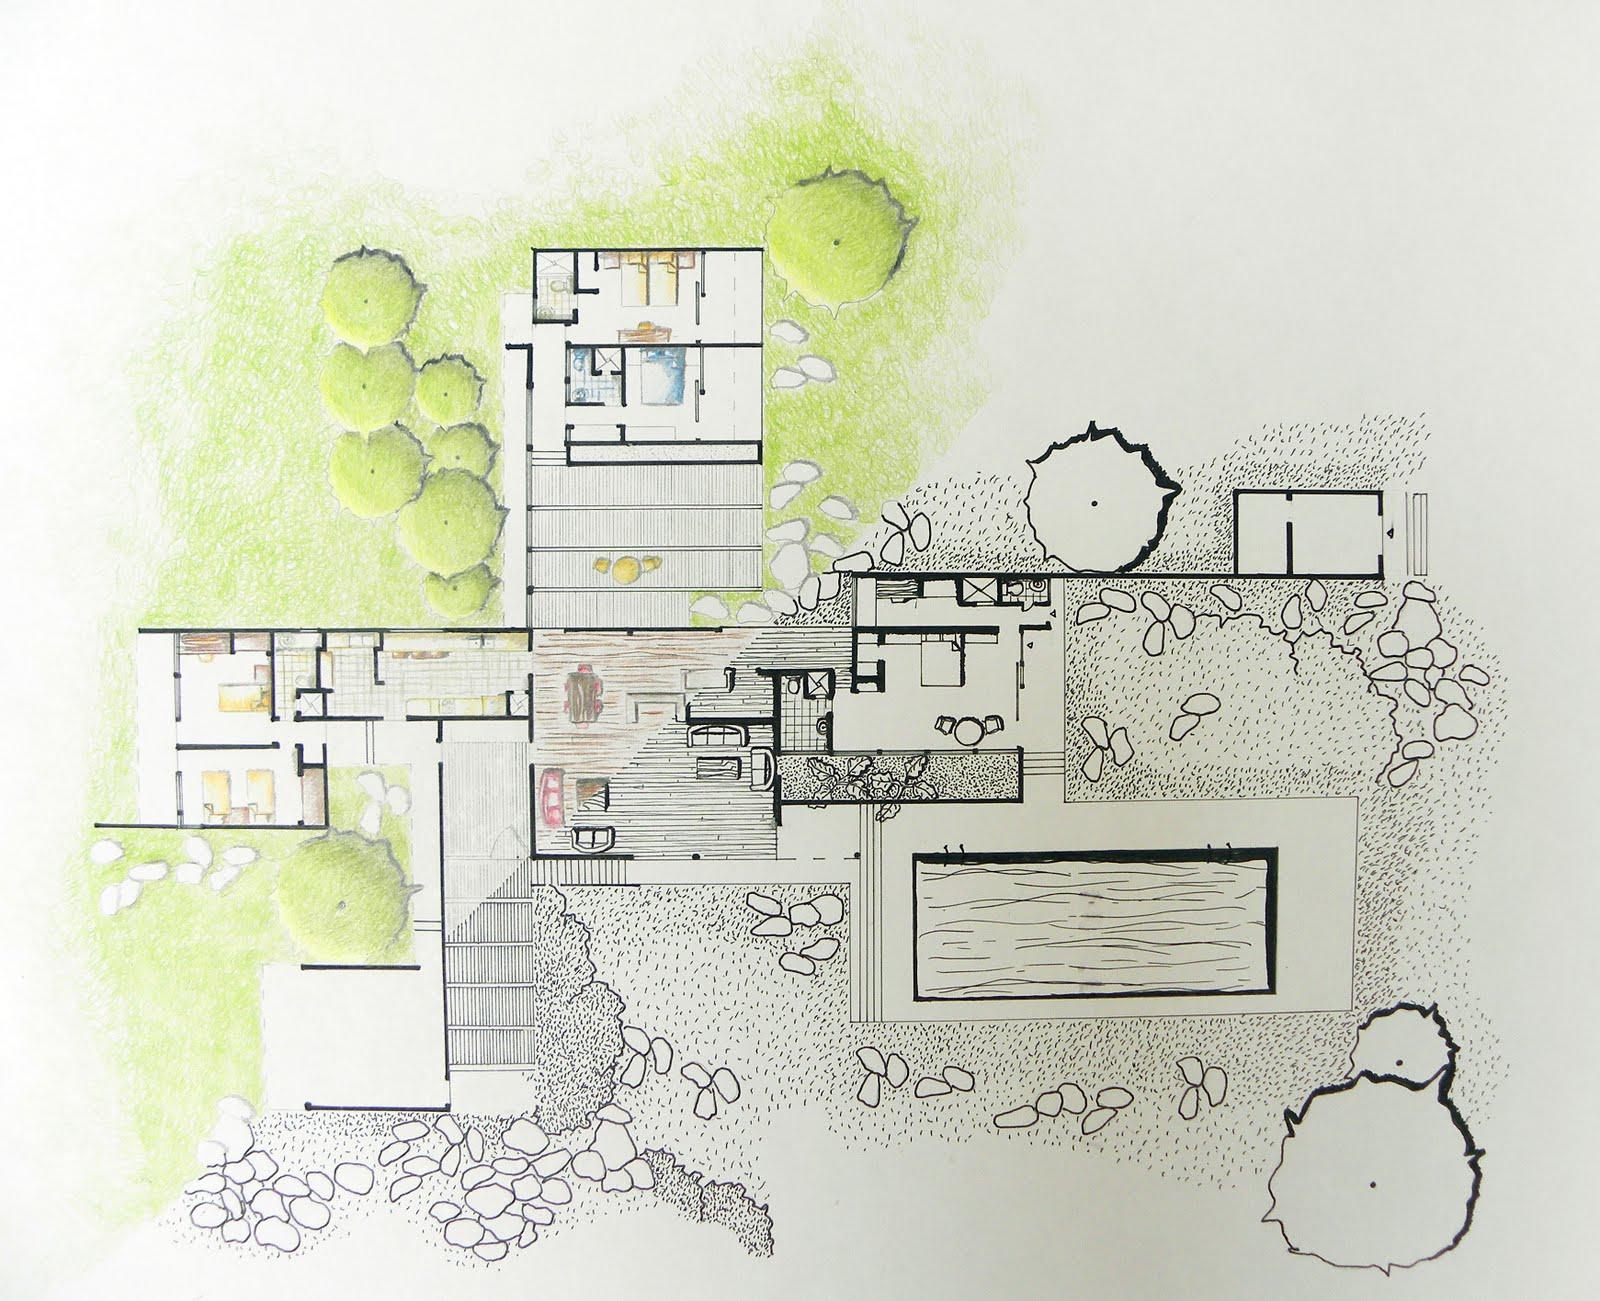 Muebles De Ba O En Planta Arquitectonica Dikidu Com # Muebles Dibujo Arquitectonico